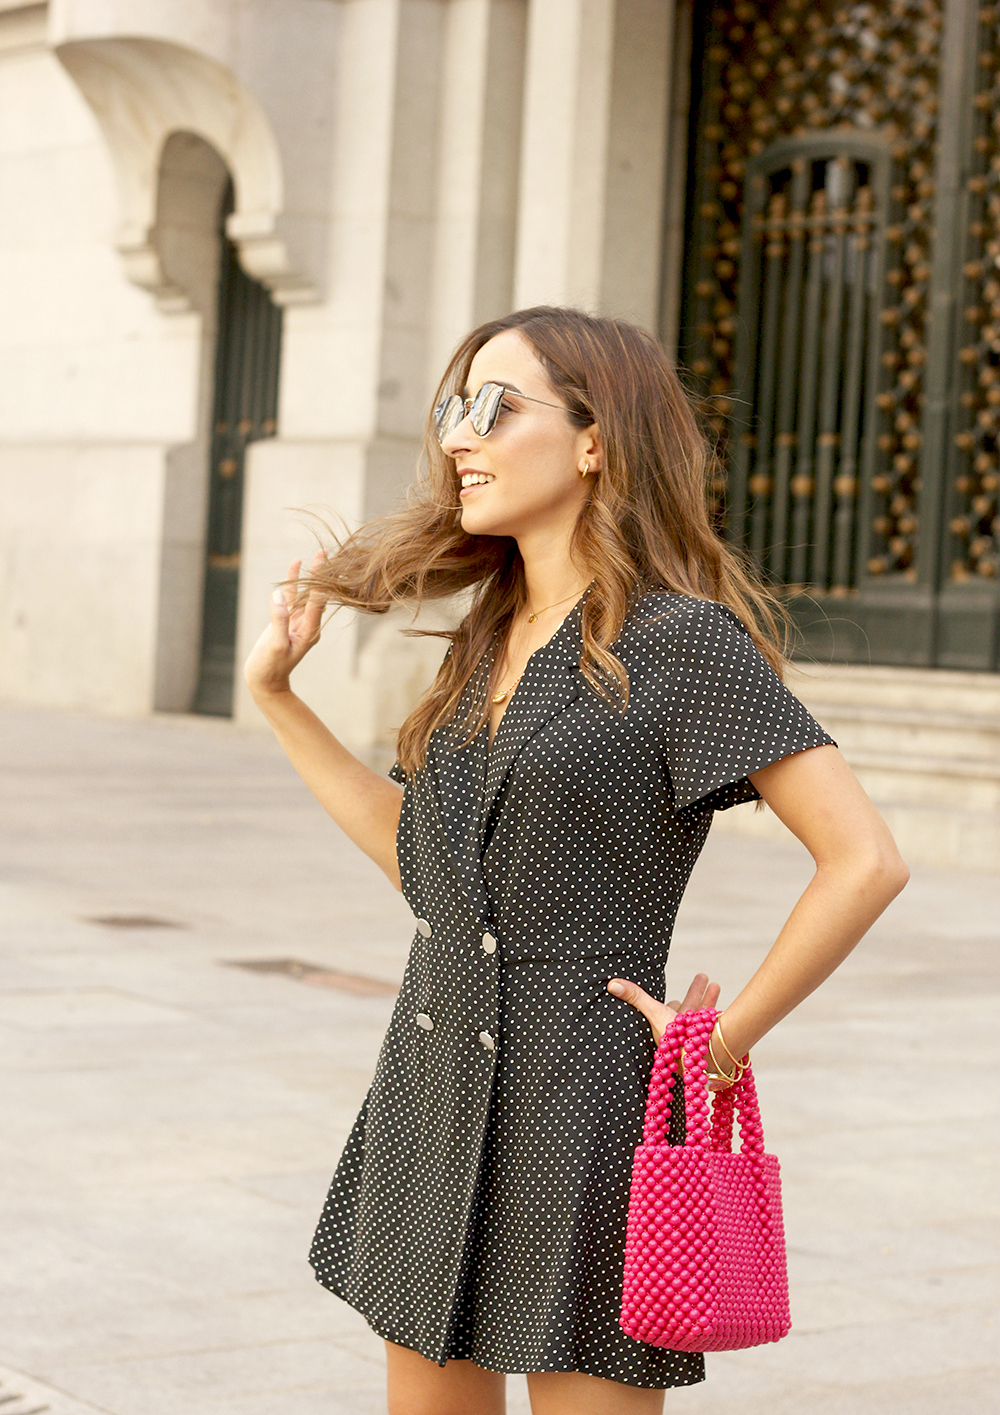 polka dot jumpsuit pink bag carolina herrera heels street style outfit summer12